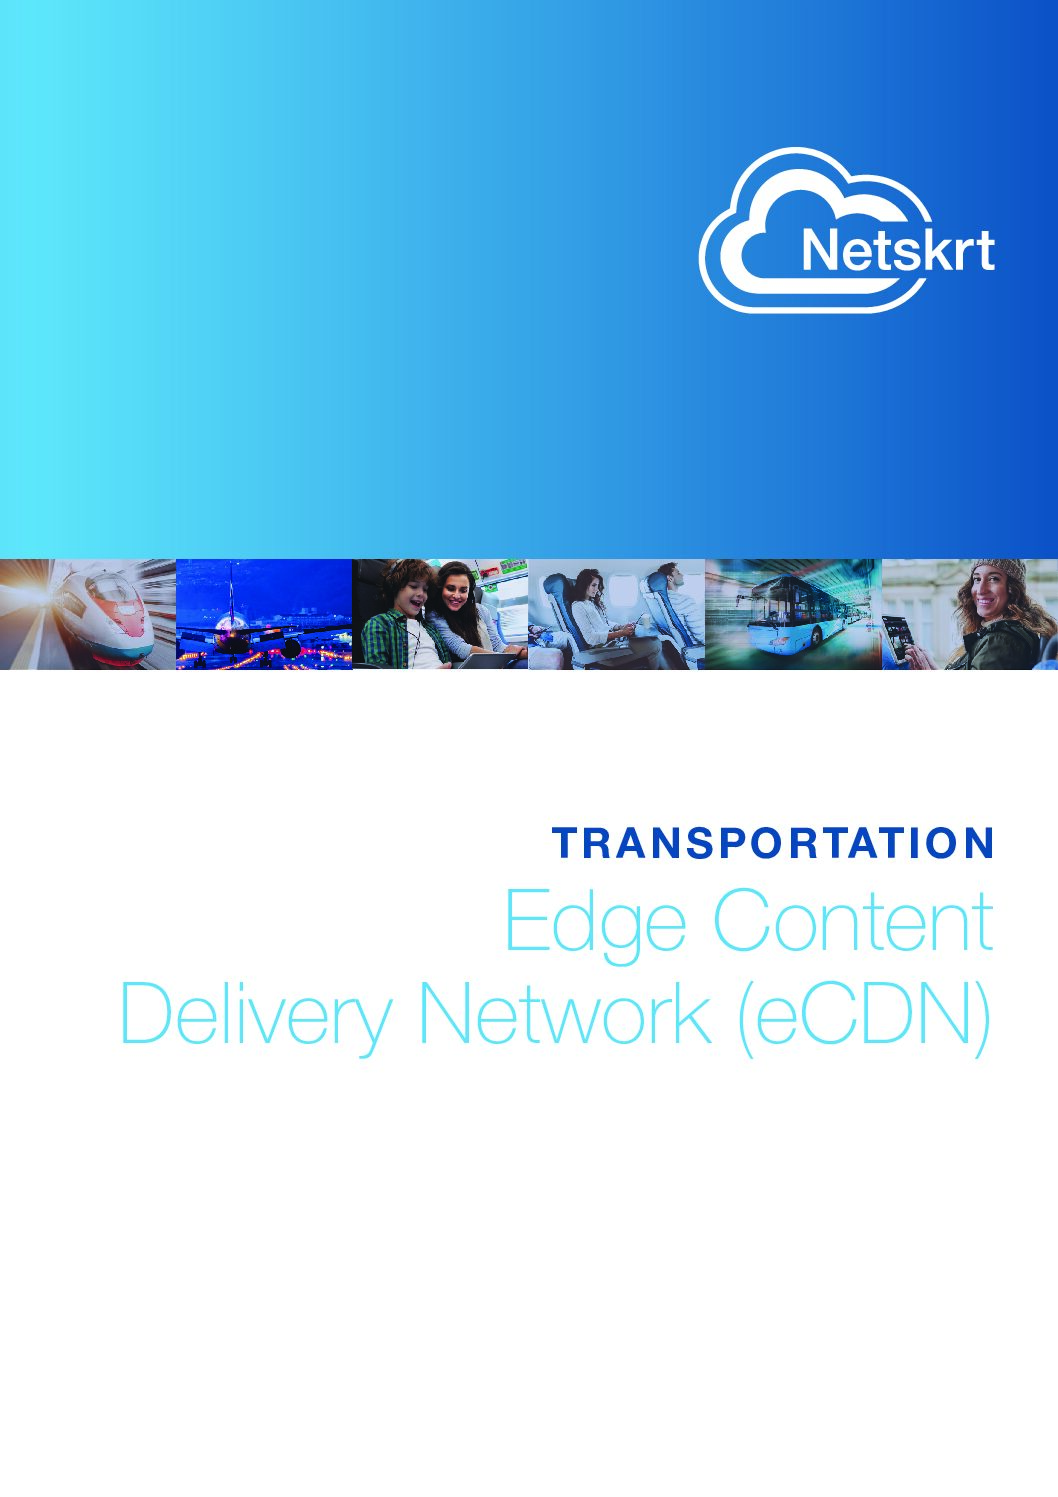 Edge Content Delivery Network (eCDN)